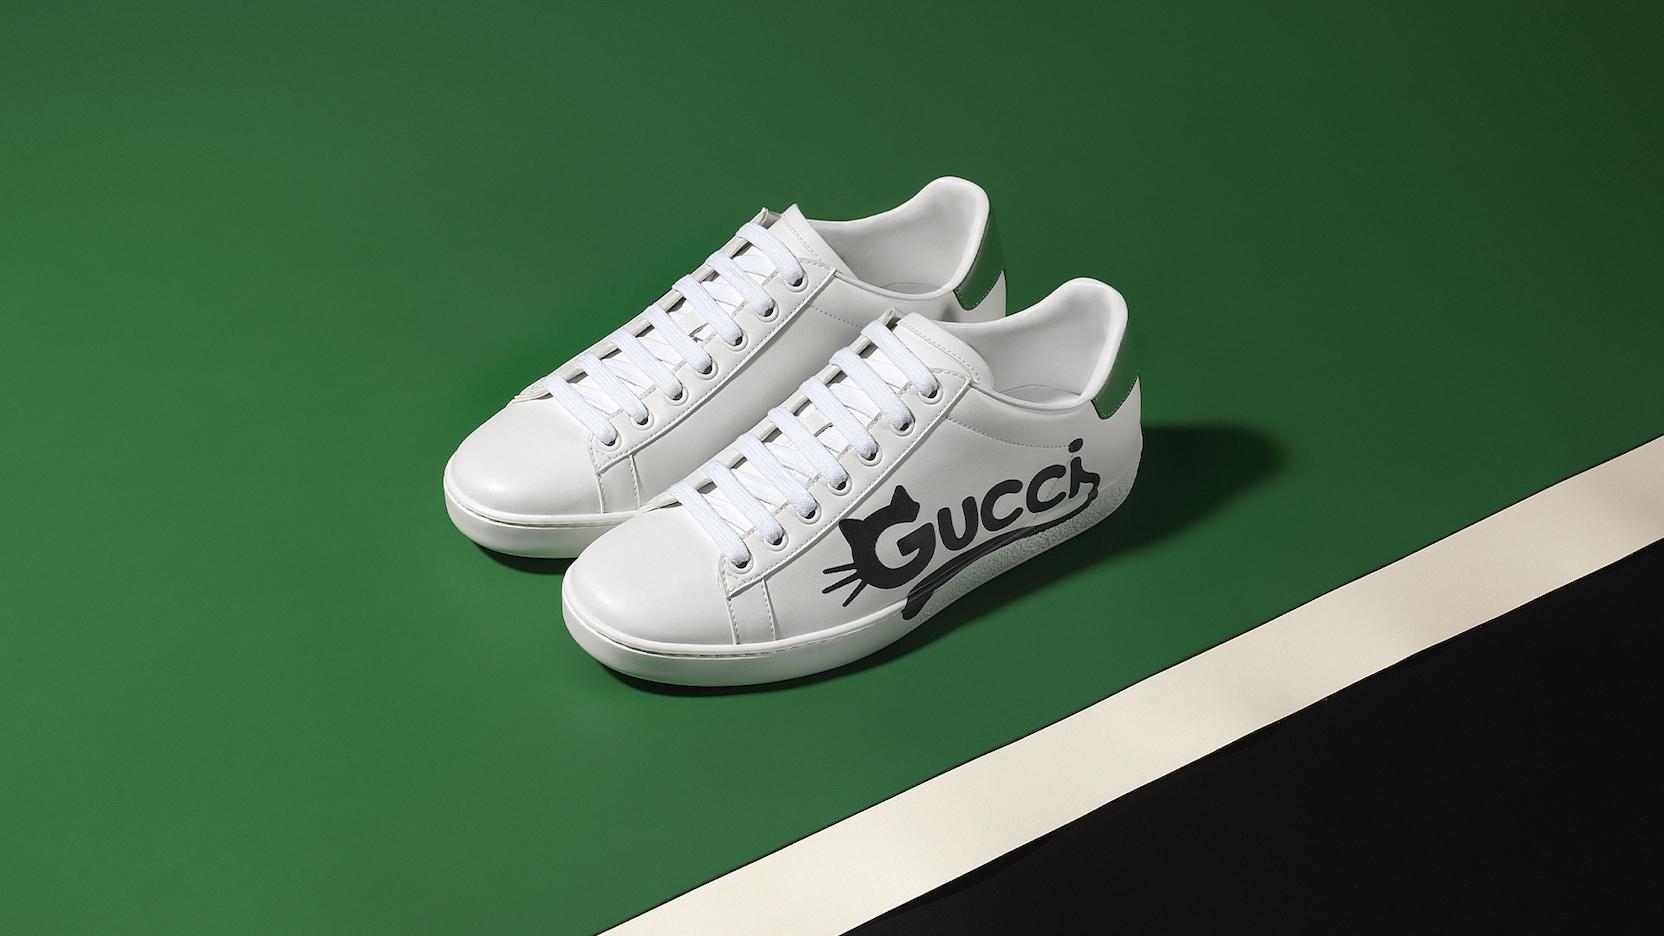 GUCCI、ラグジュアリーファッションの素材を革新